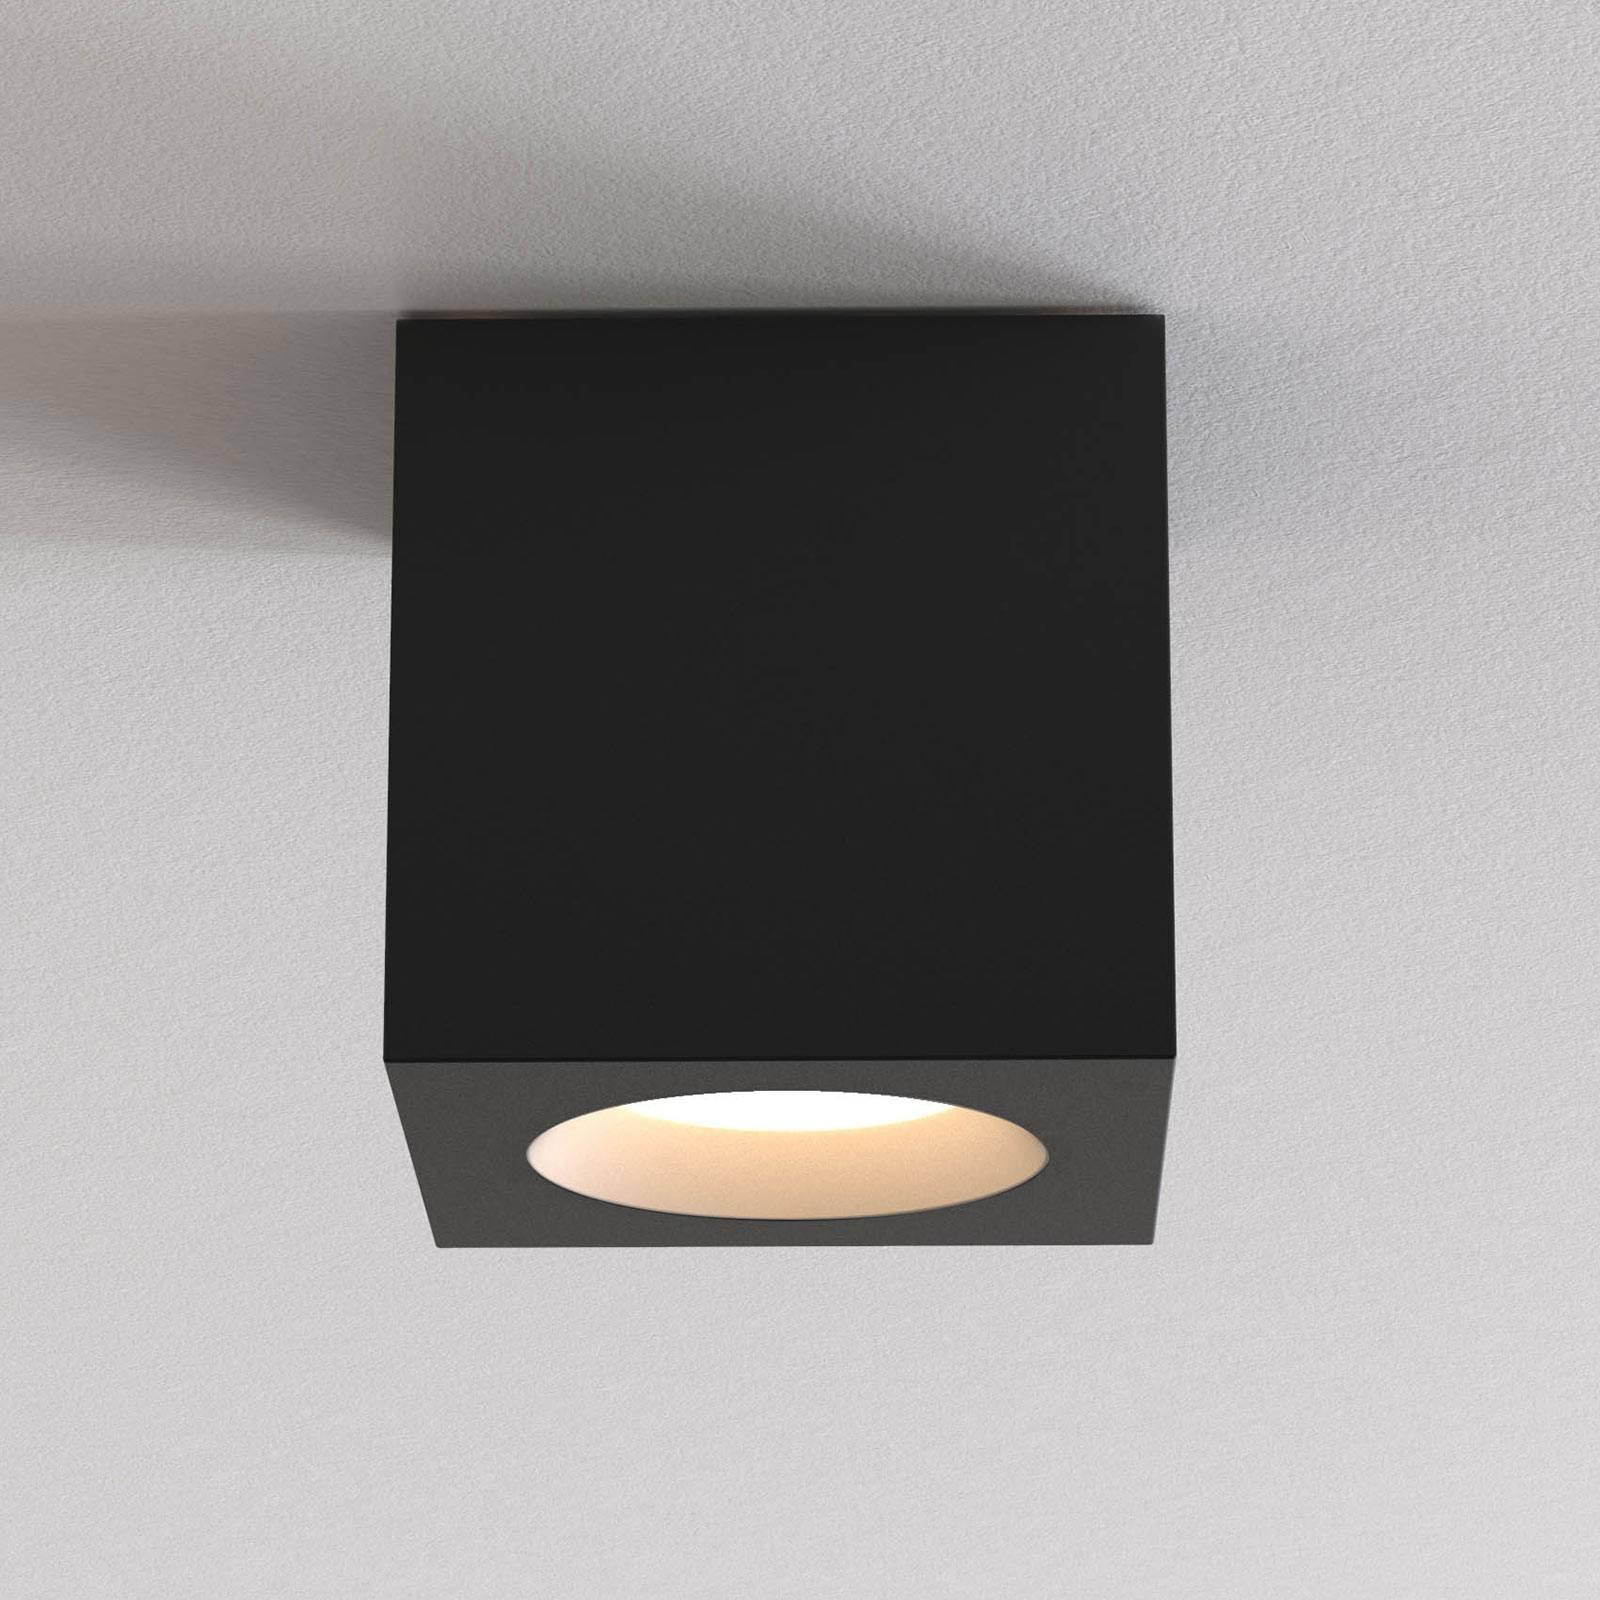 Astro Kos Square II taklampe, svart